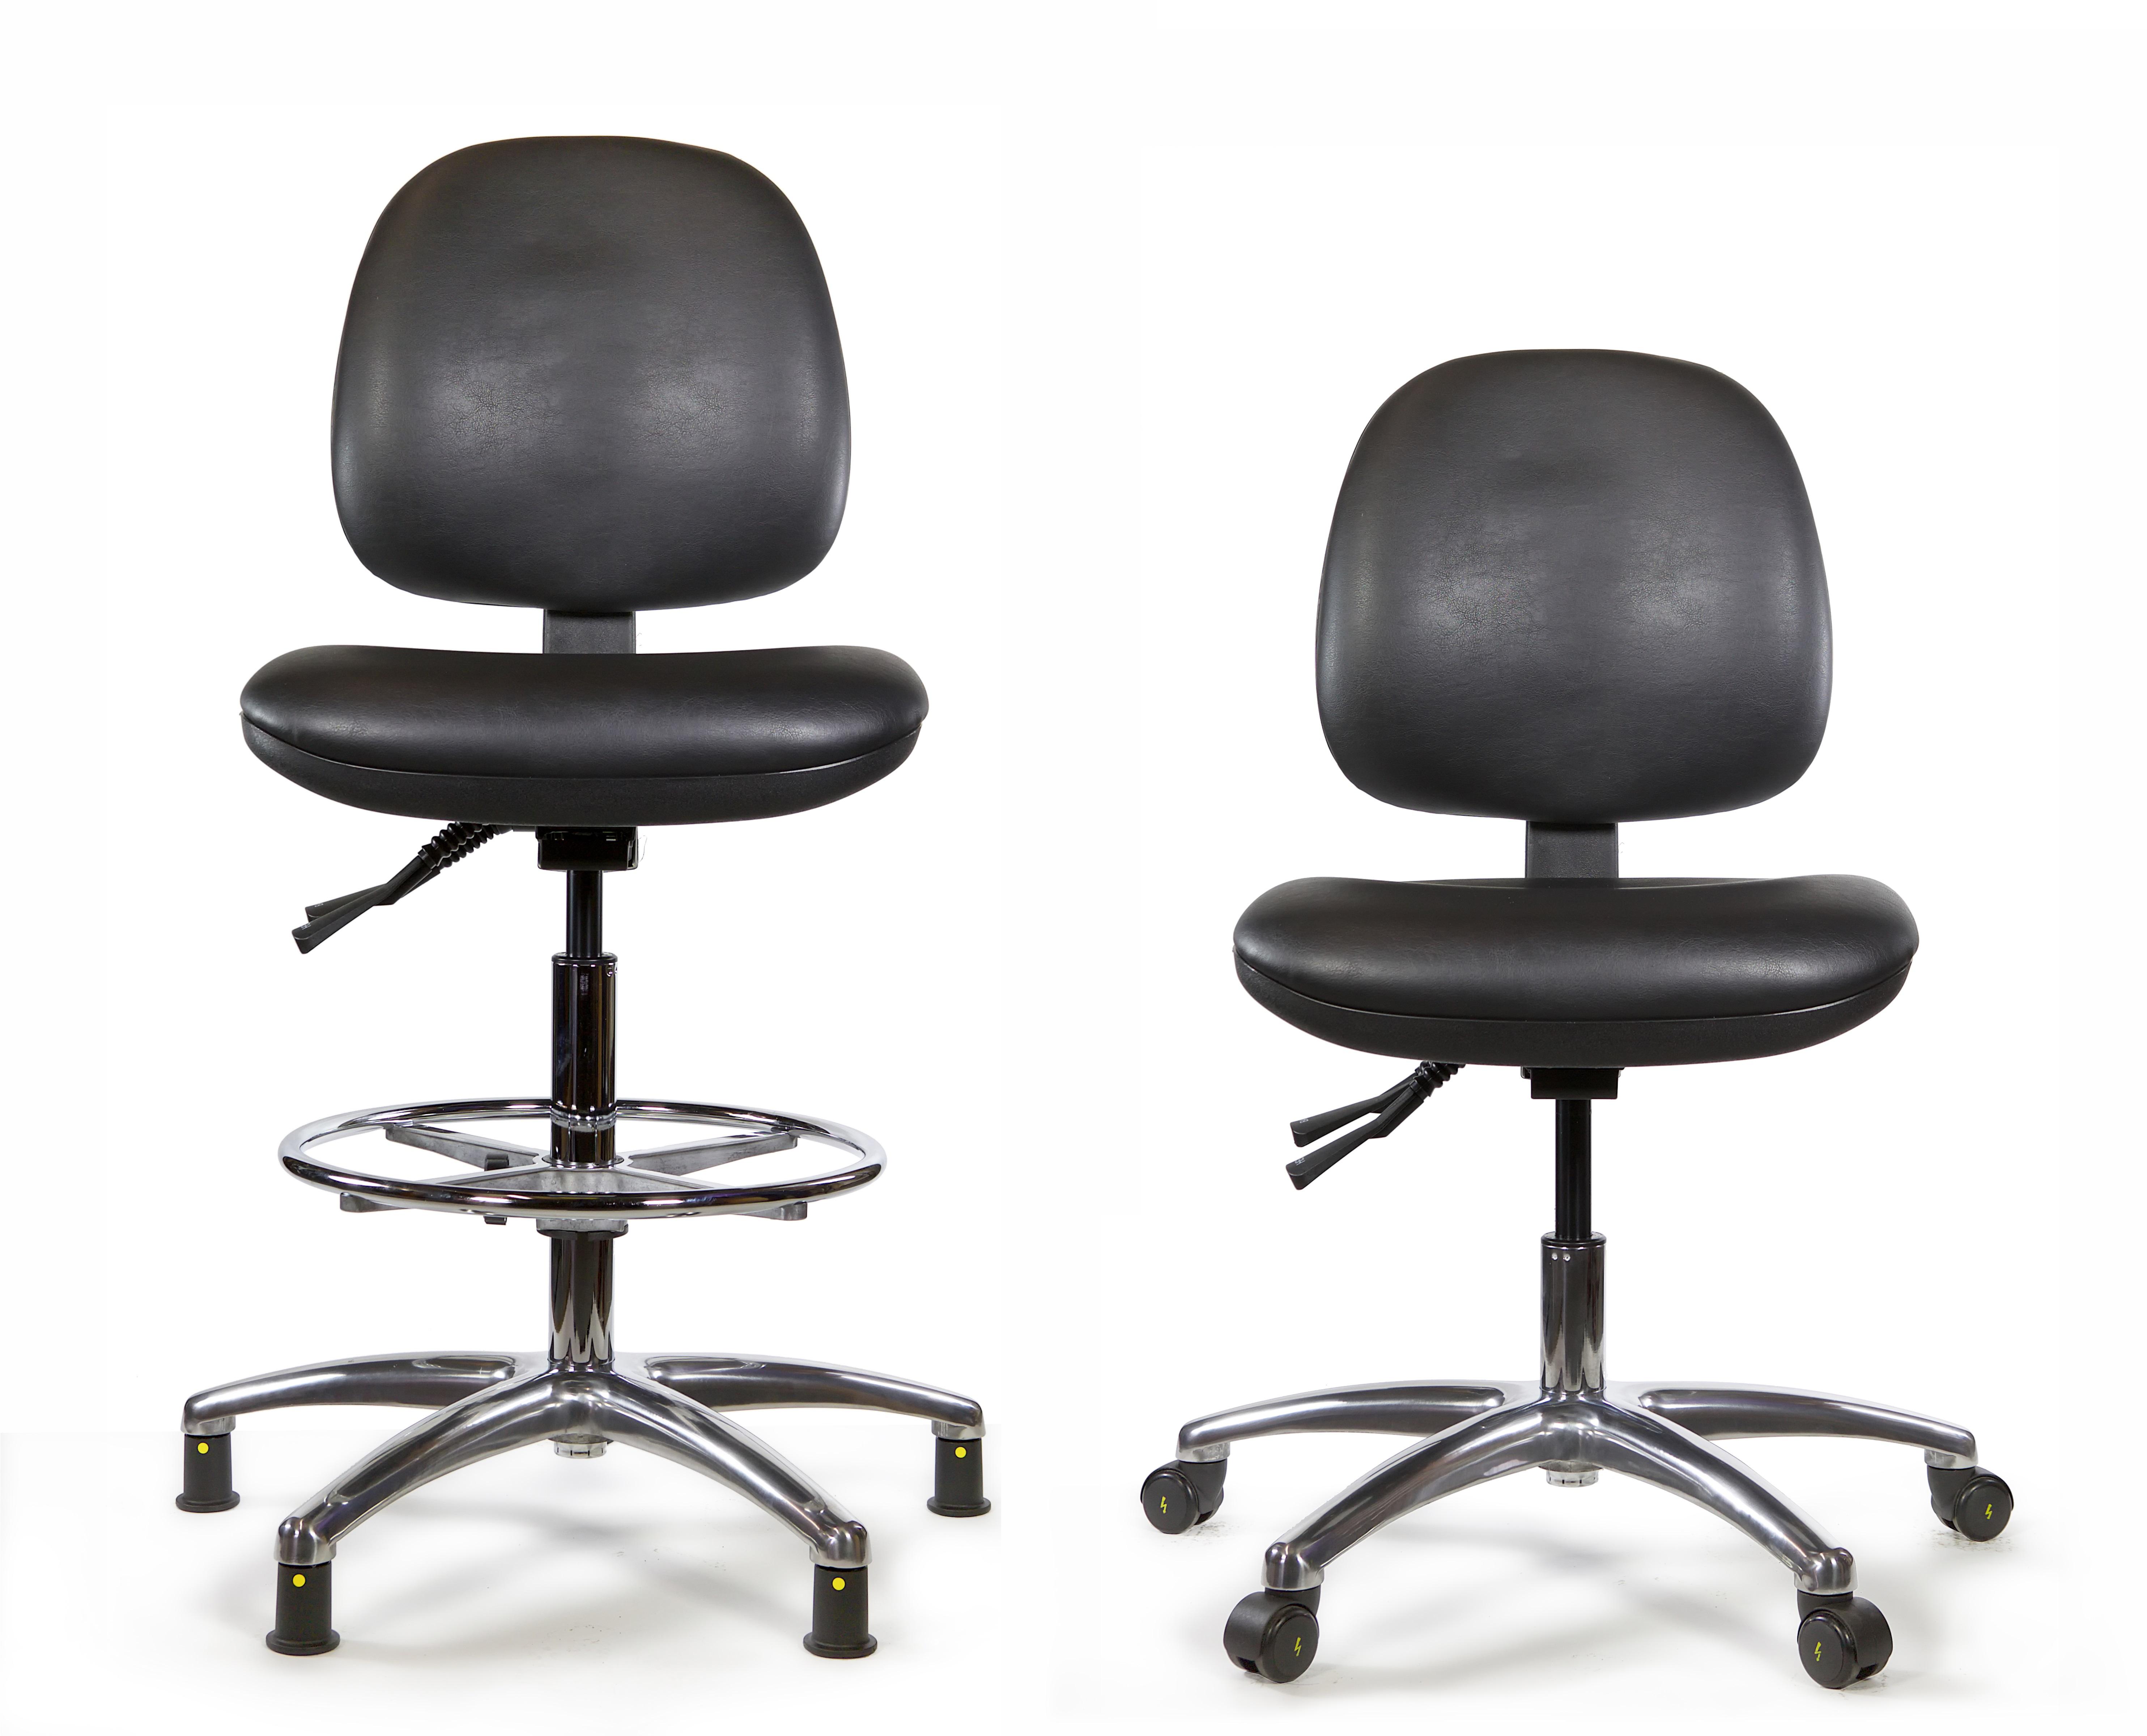 C-tech Lab Chairs